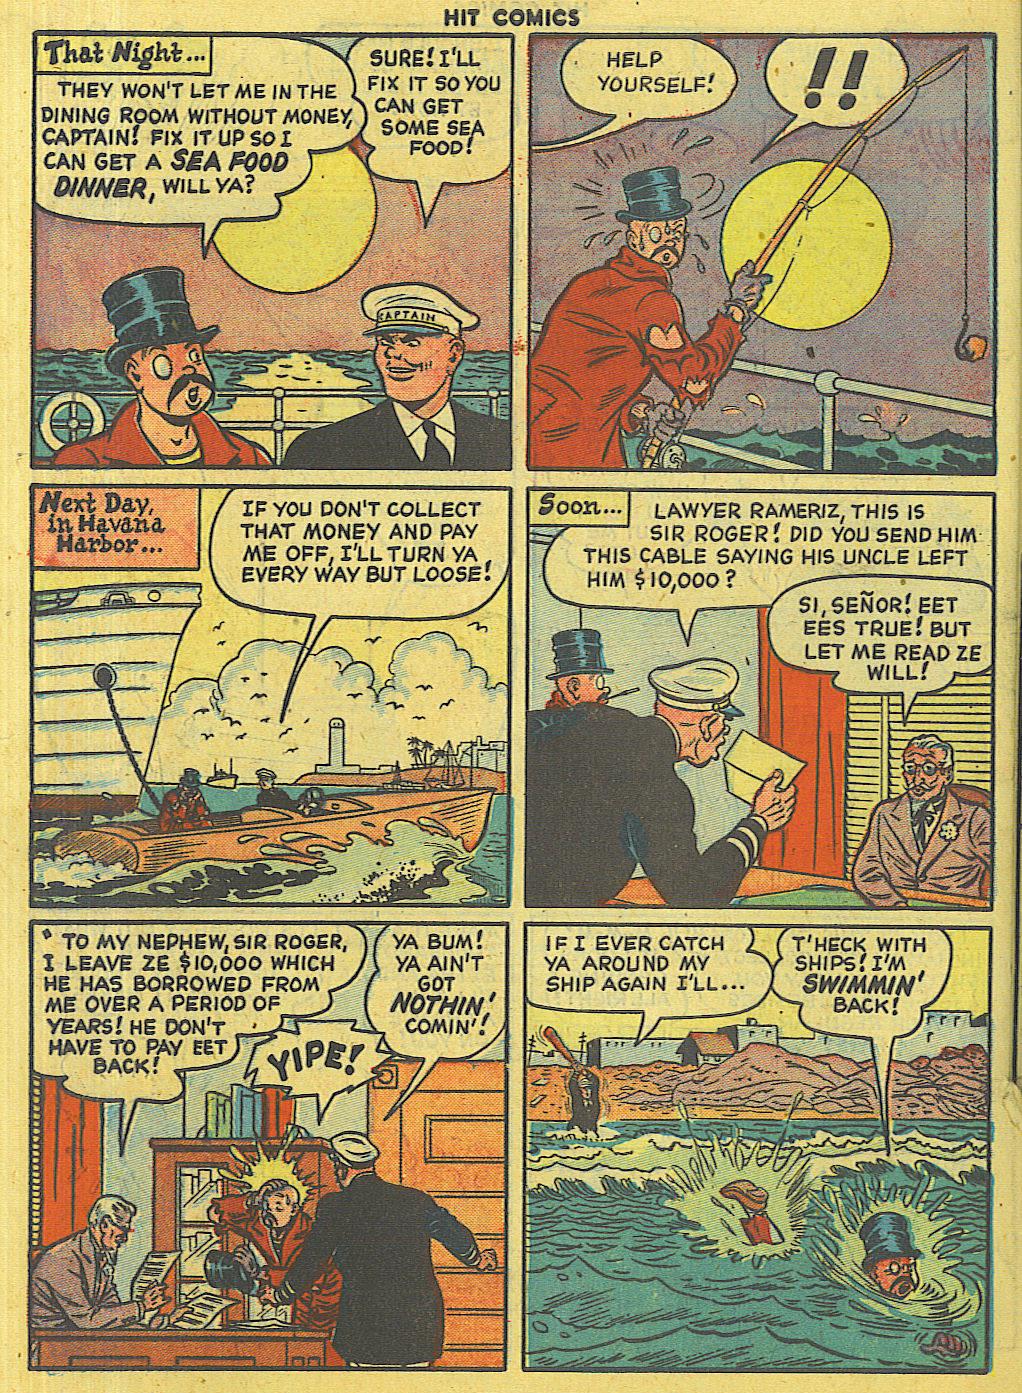 Read online Hit Comics comic -  Issue #56 - 42